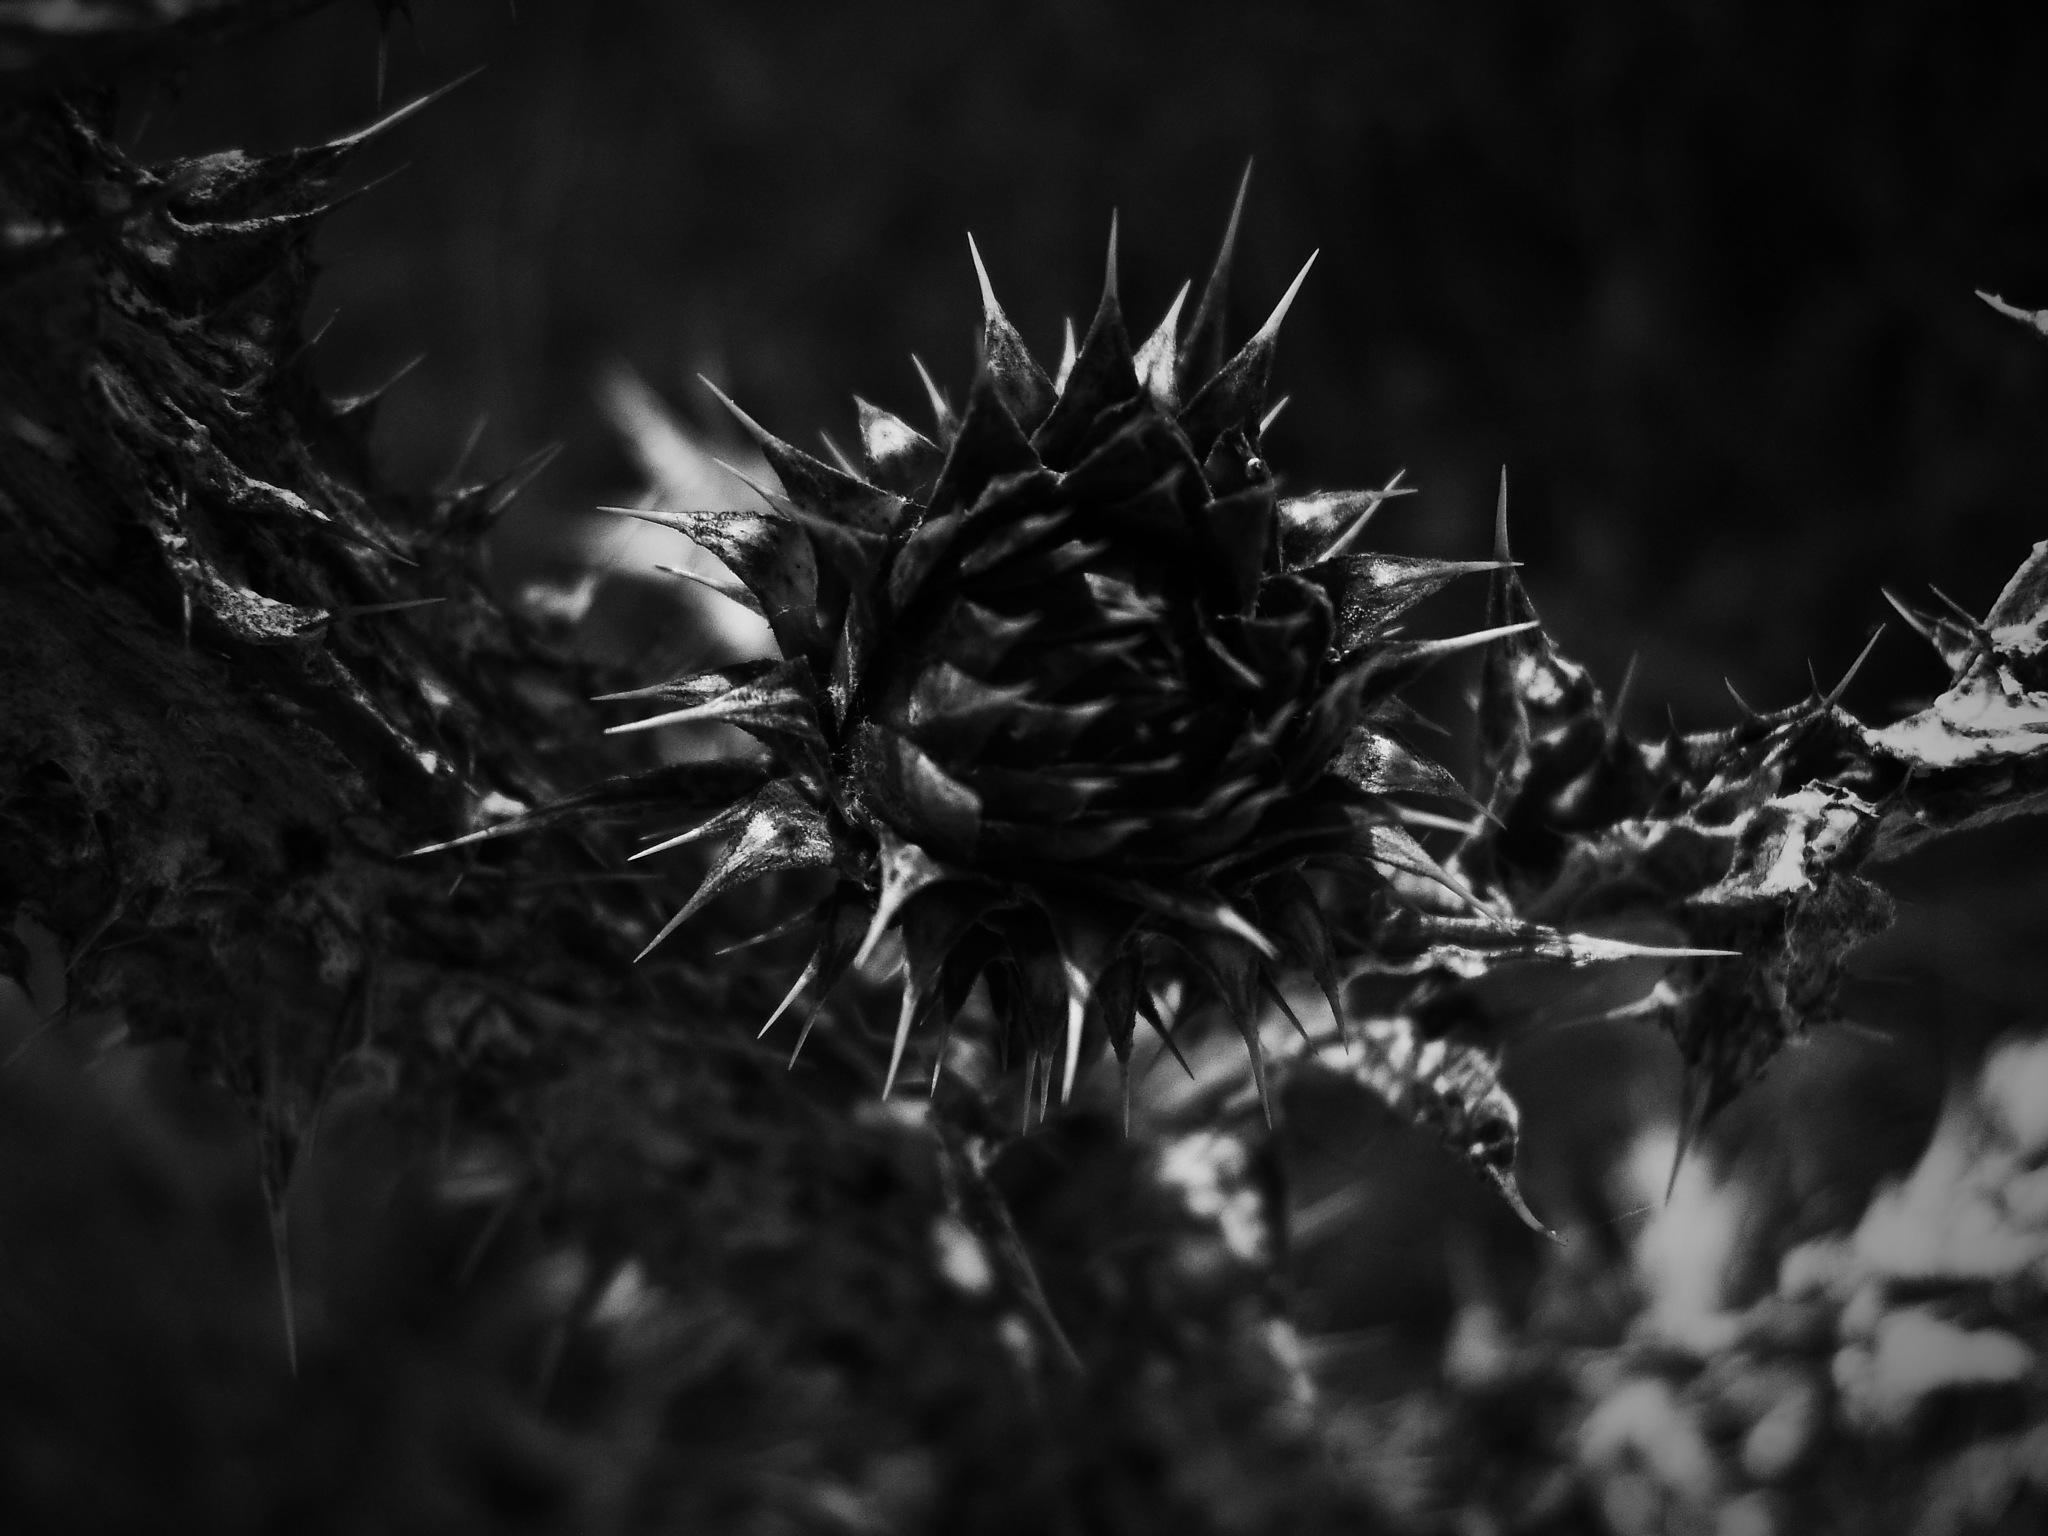 Untitled by sunnydreams7